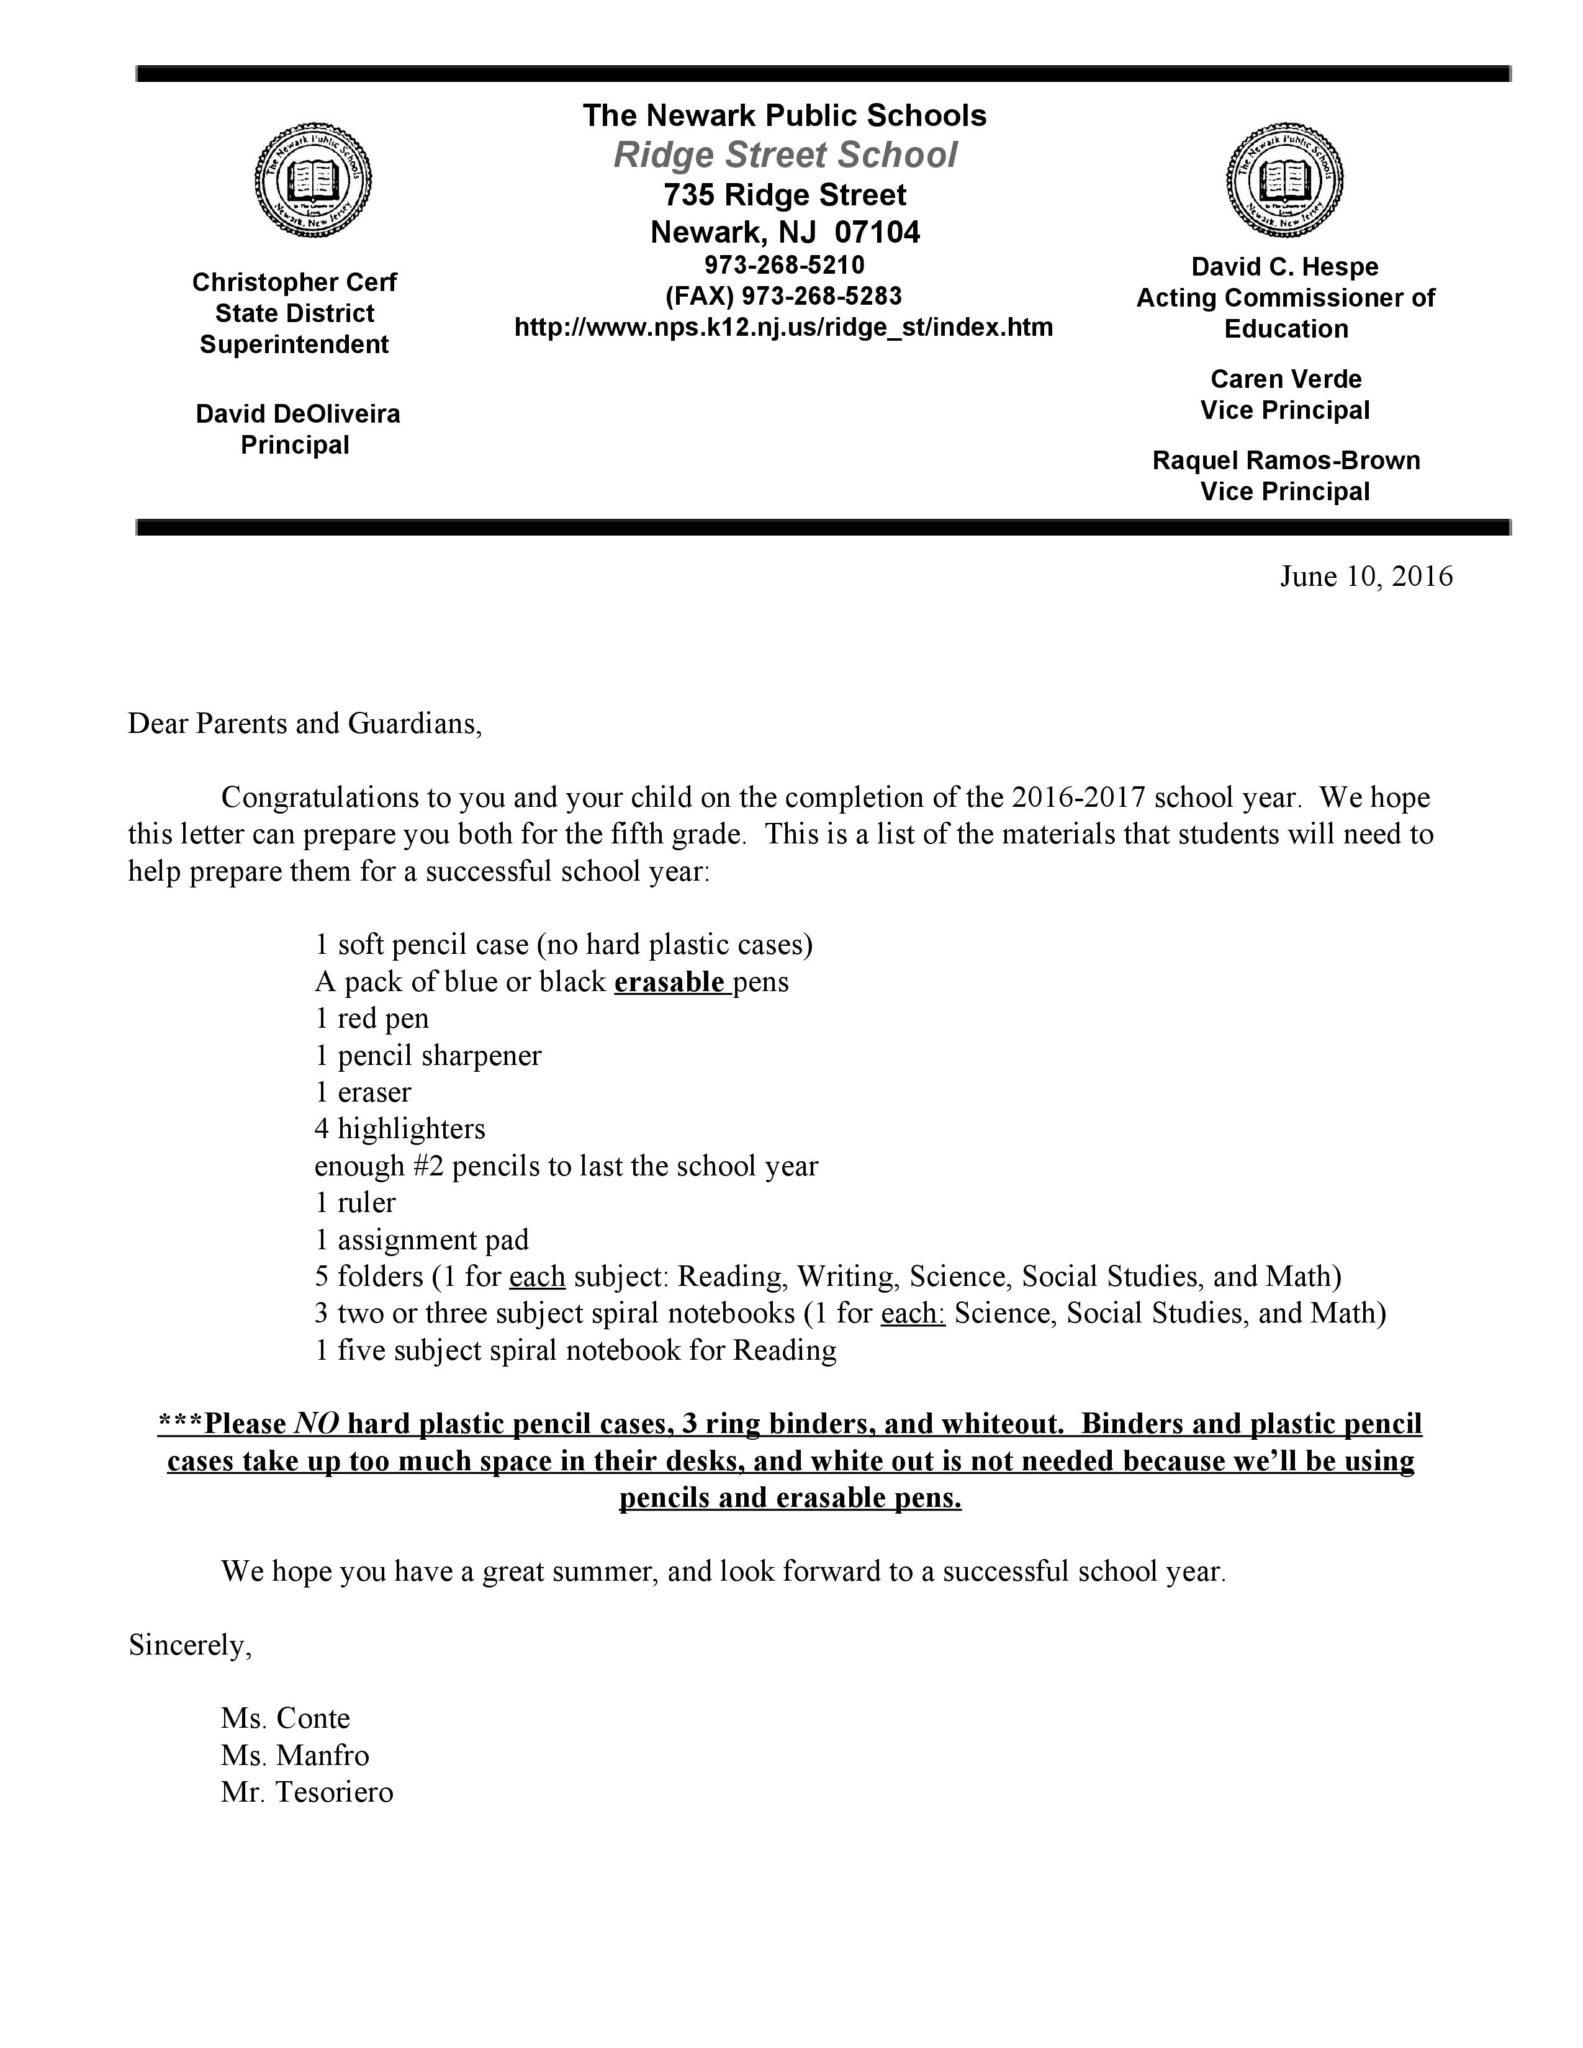 Rising 4th Graders School Supplies List